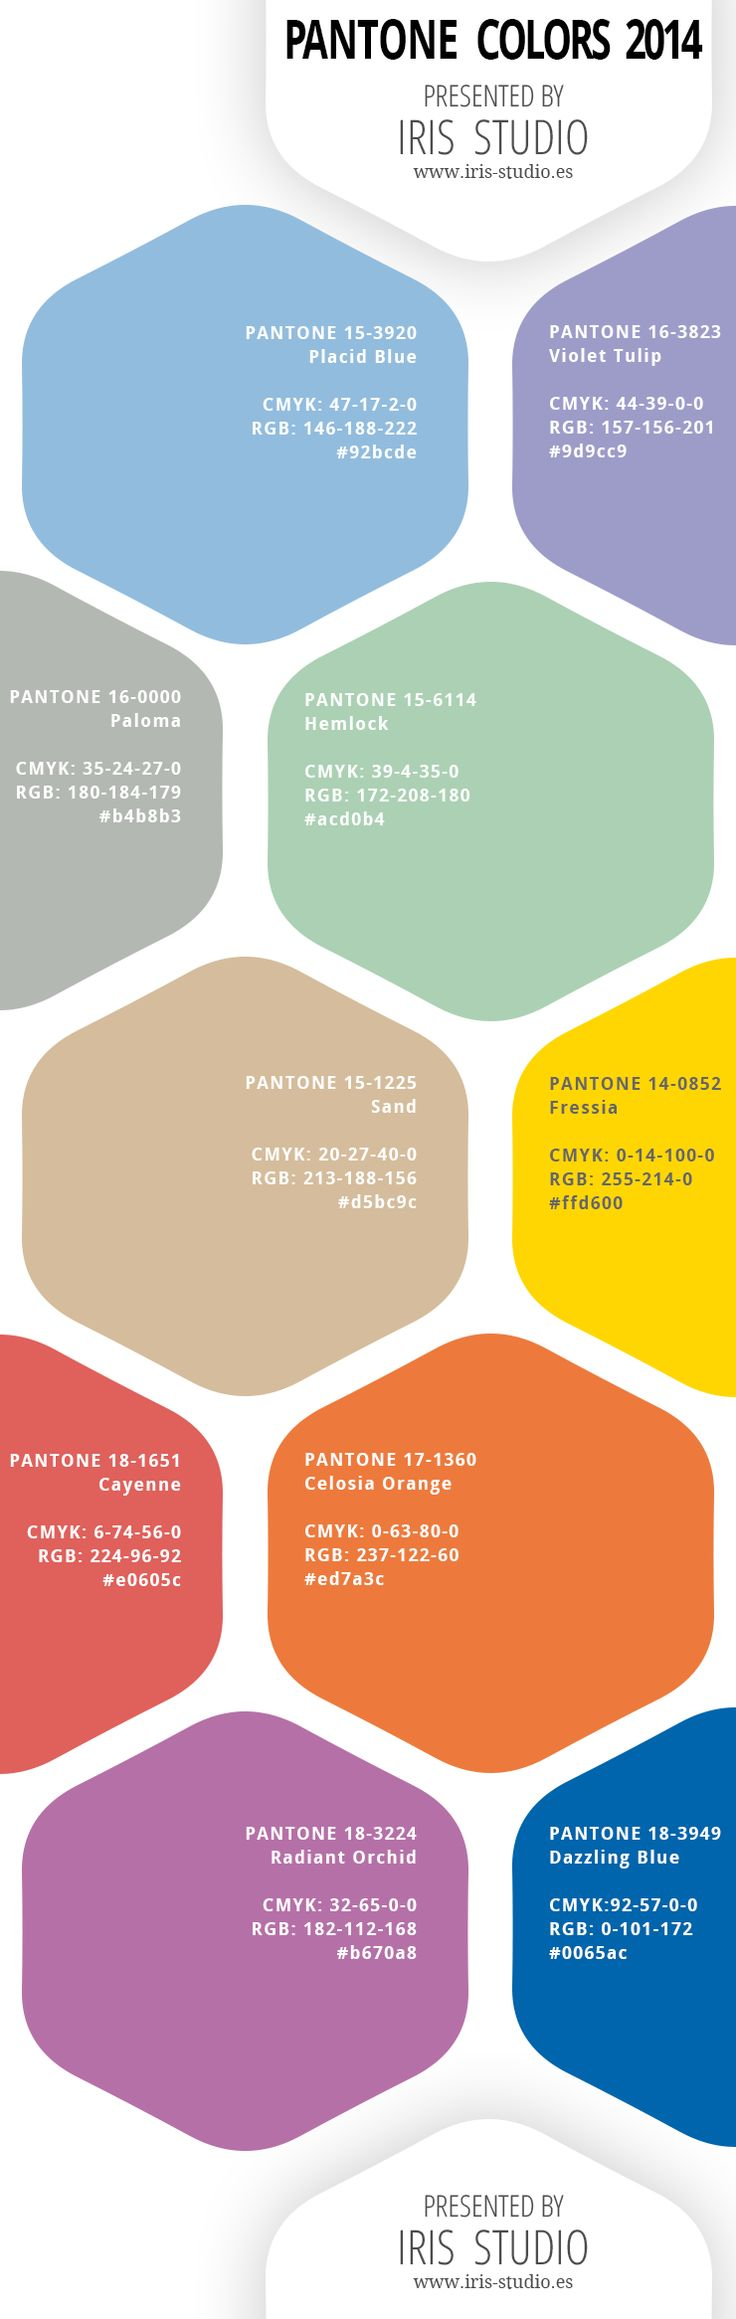 Papersource Colors — CMYK + PANTONE - Paperwheel letterpress ink mixing  cheat sheet! | Helpful Tips | Pinterest | Pantone, Letterpresses and Pms  colour